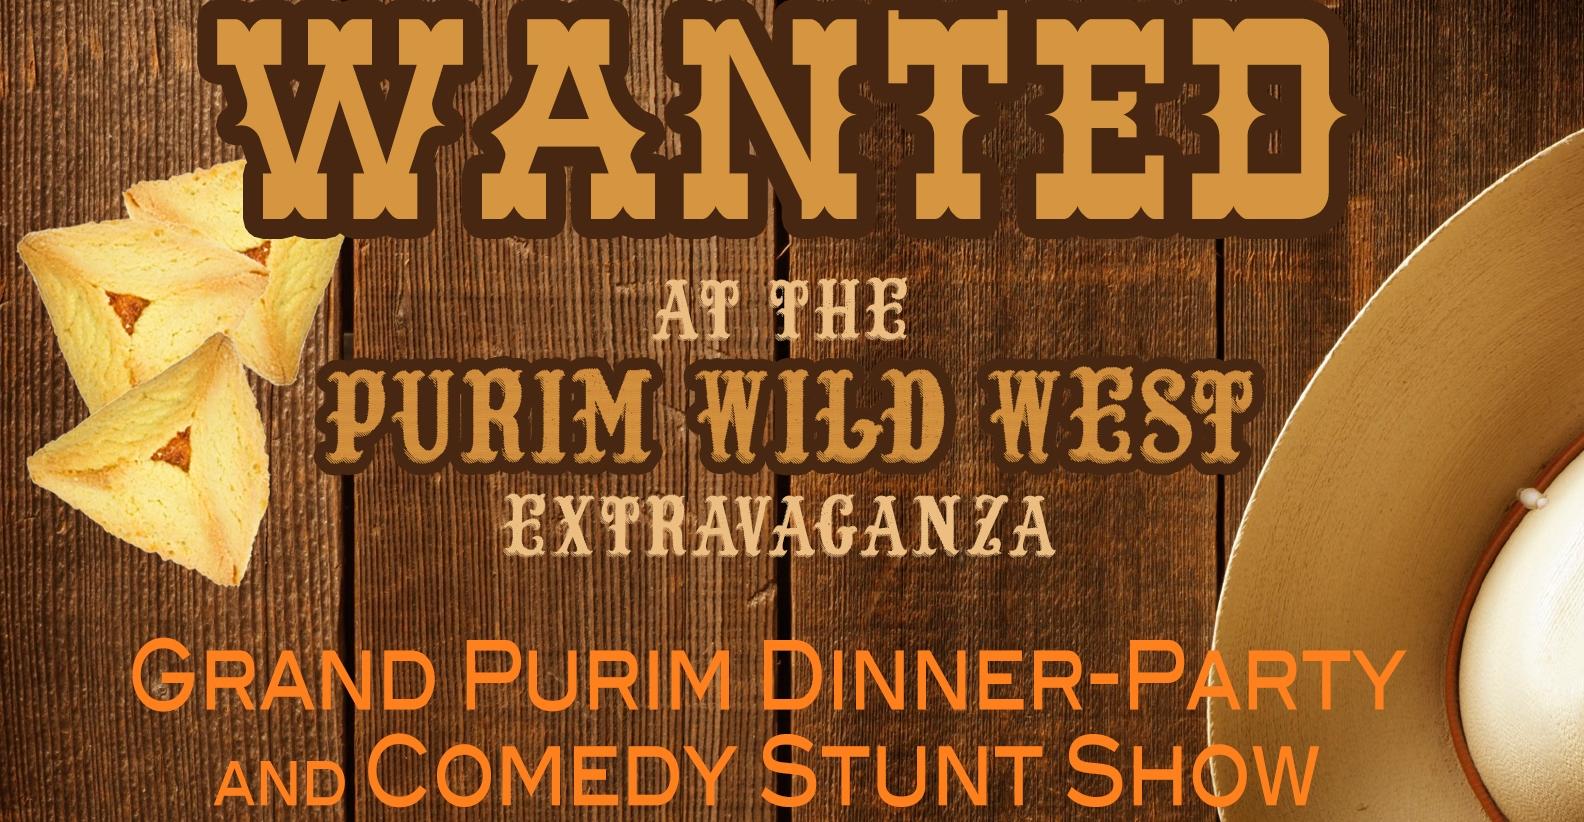 purim-in-the-wild-west-promo.jpg